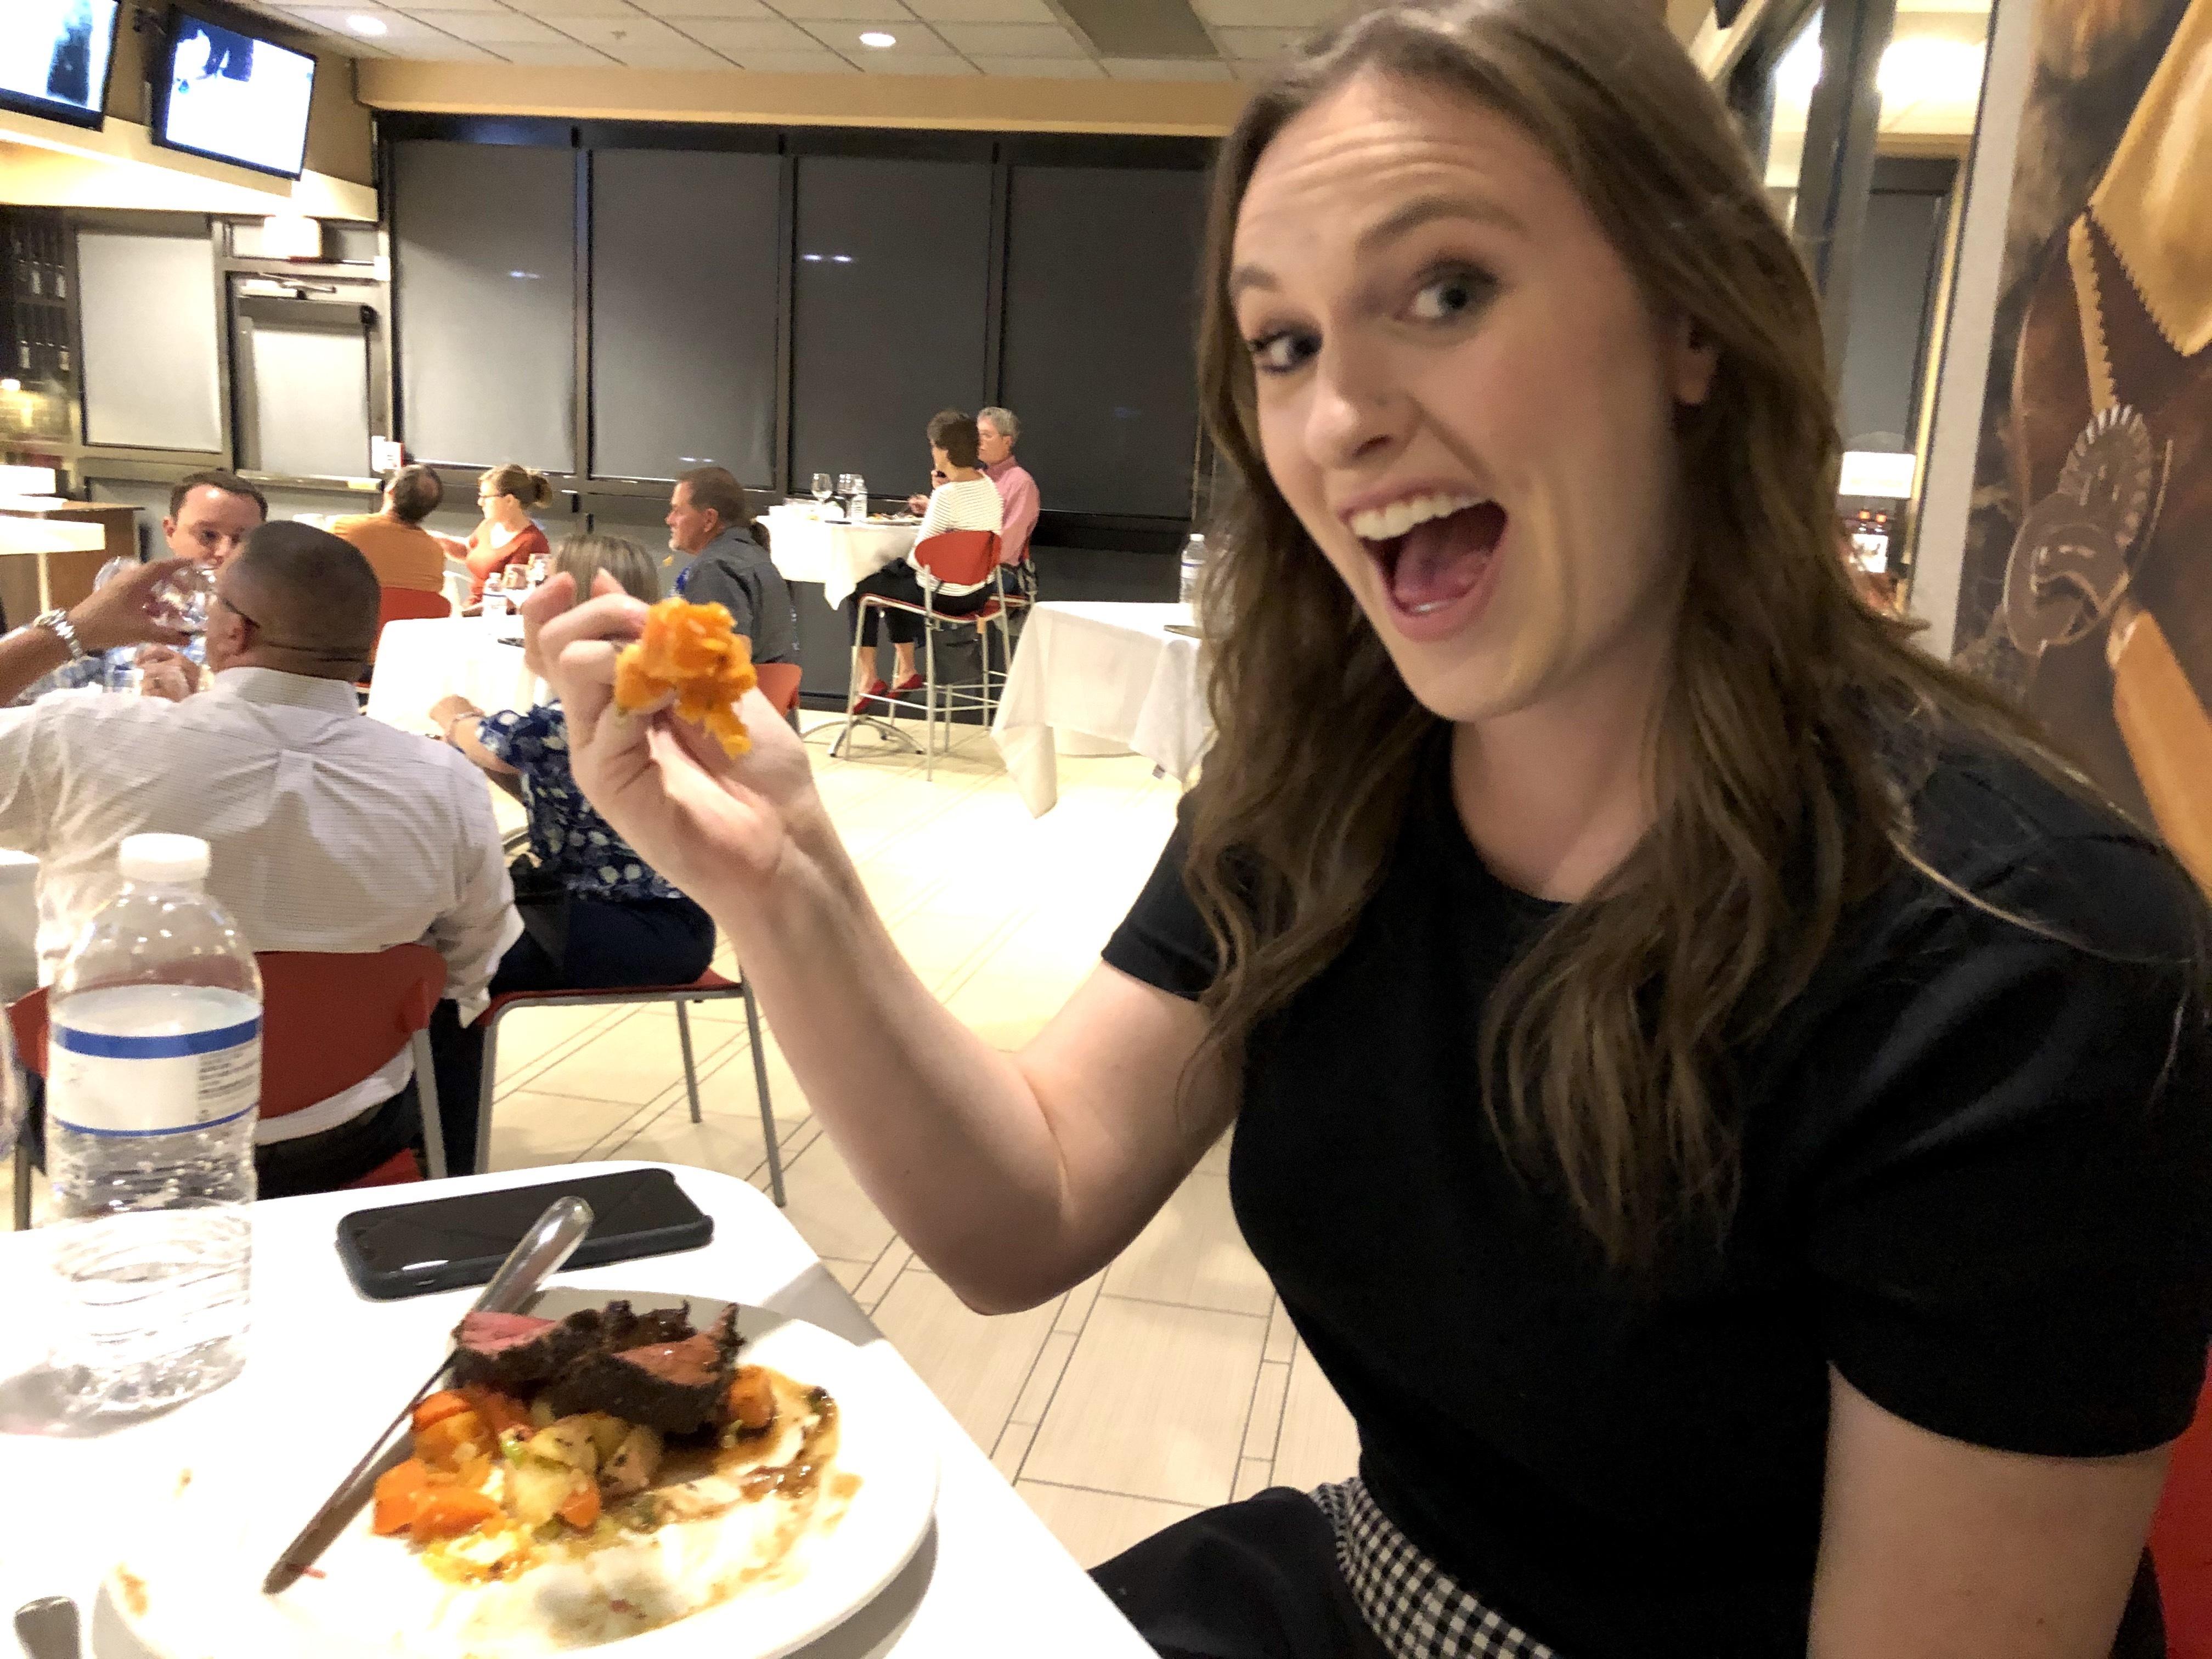 LALtoday editor Katelyn enjoying her meal